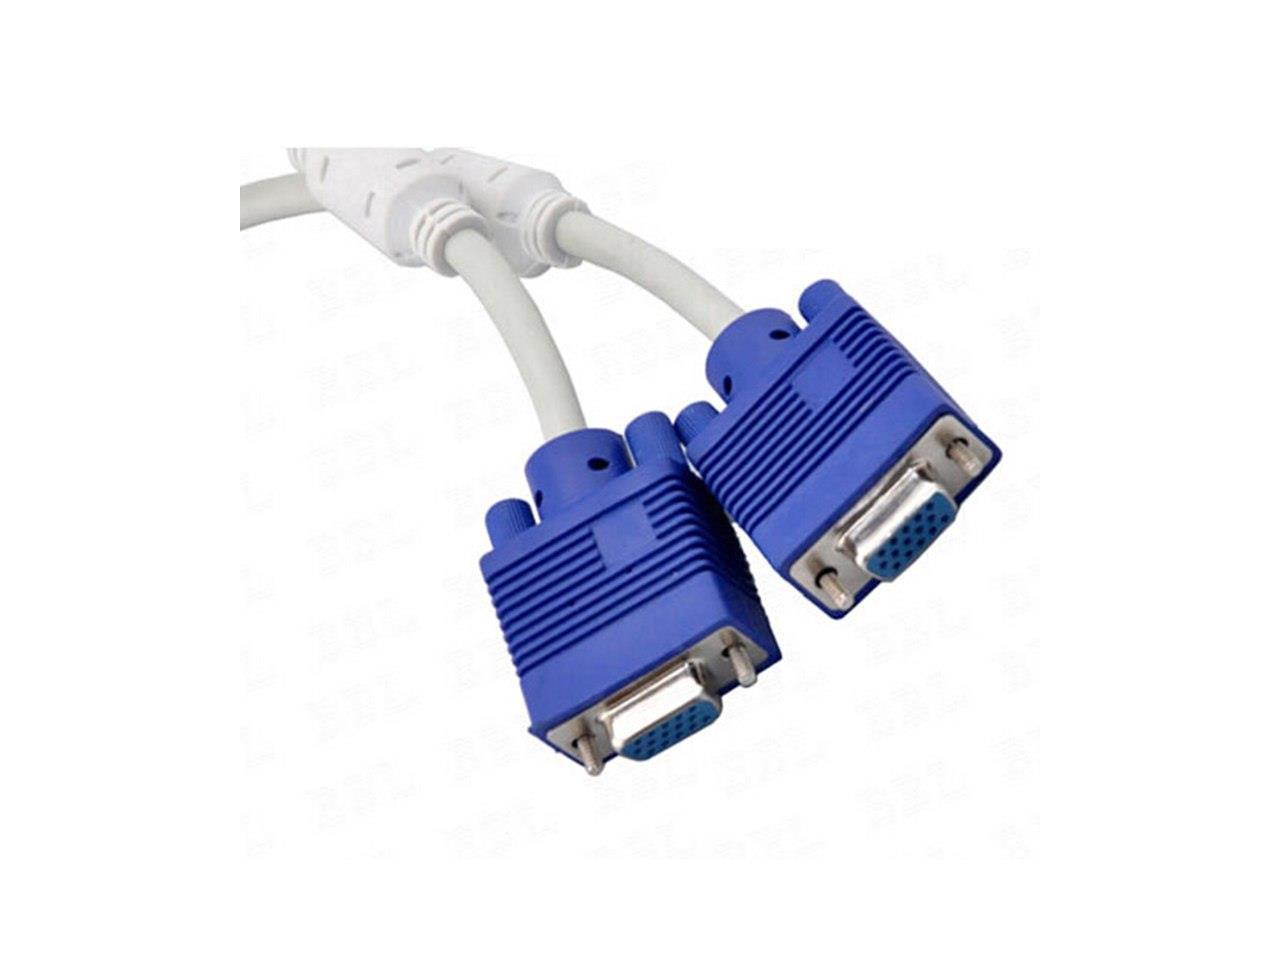 BestOfferBuy 15 Pin VGA Male to 2 Dual VGA Female Video Monitor Splitter Cable